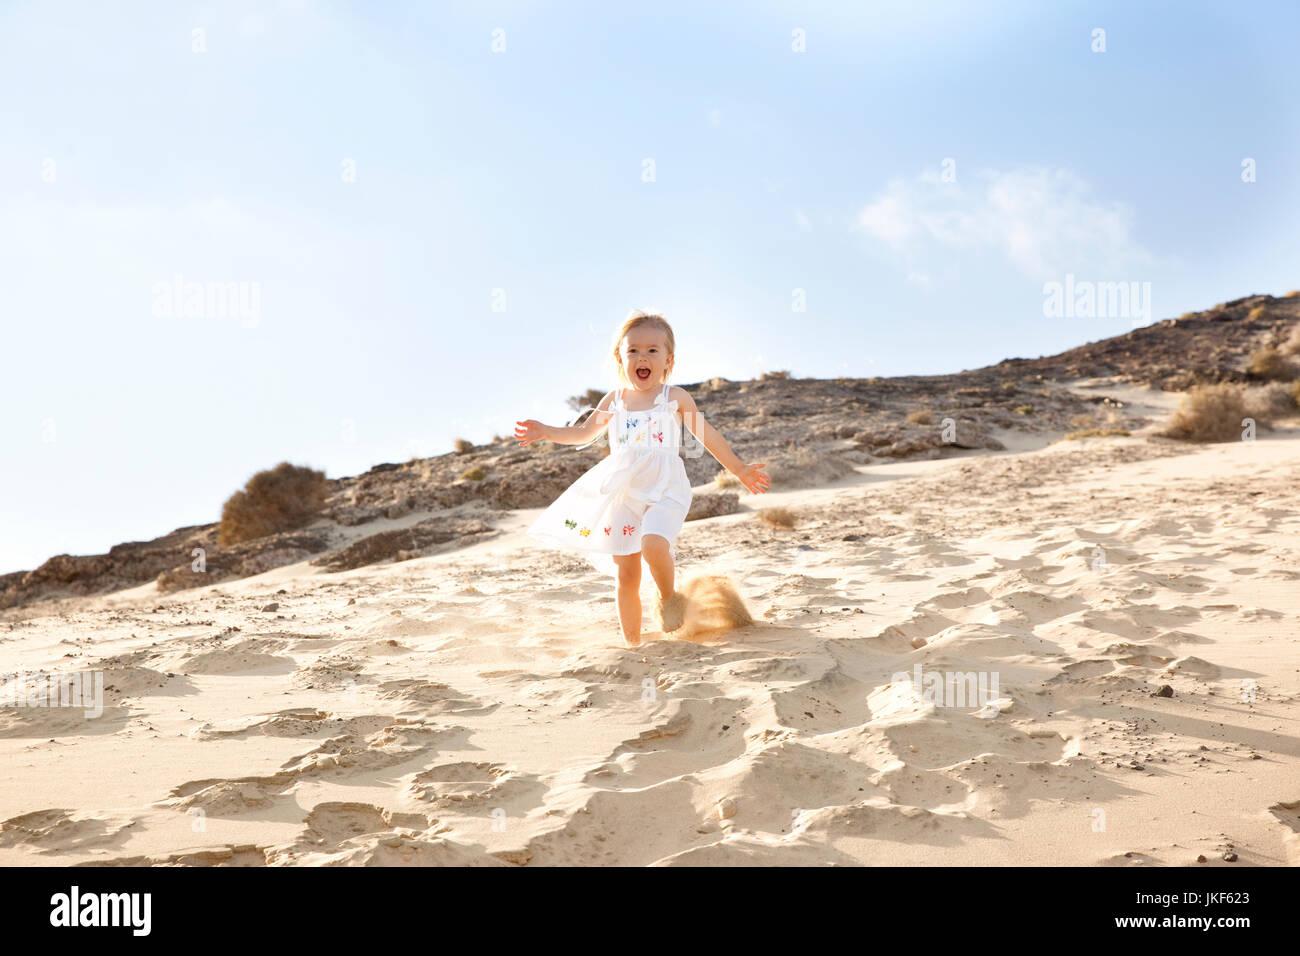 Spanien, Fuerteventura, Mädchen, die Düne am Strand Stockbild